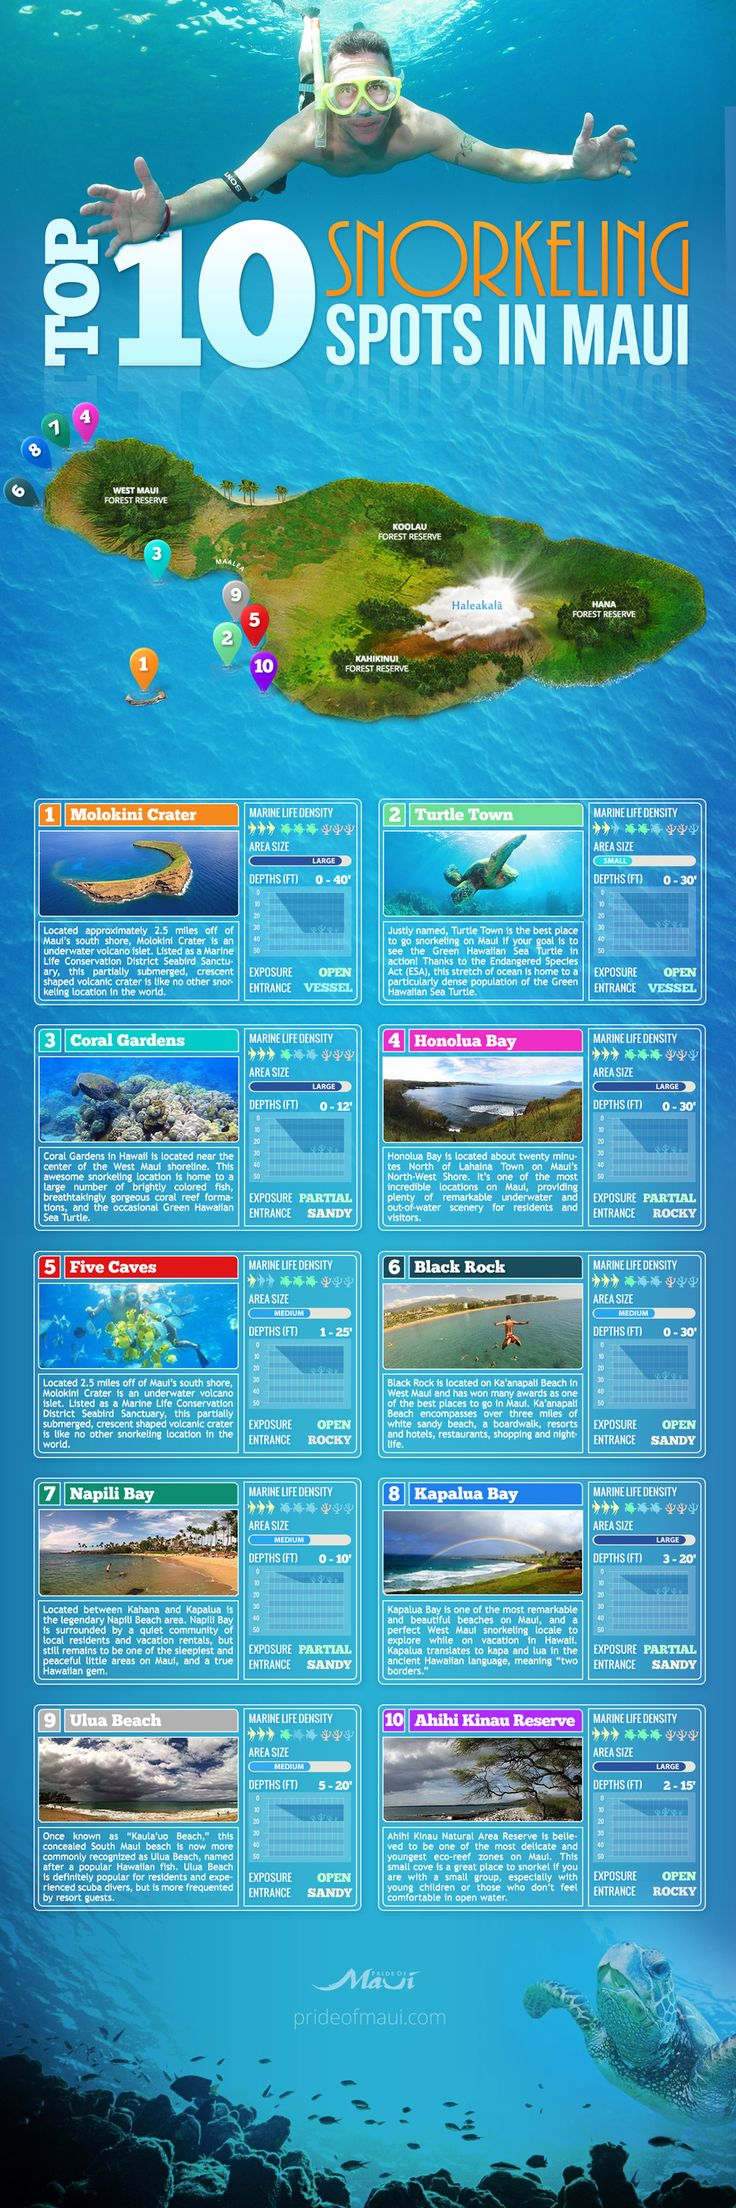 Maui snorkeling spots                                                                                                                                                                                 More